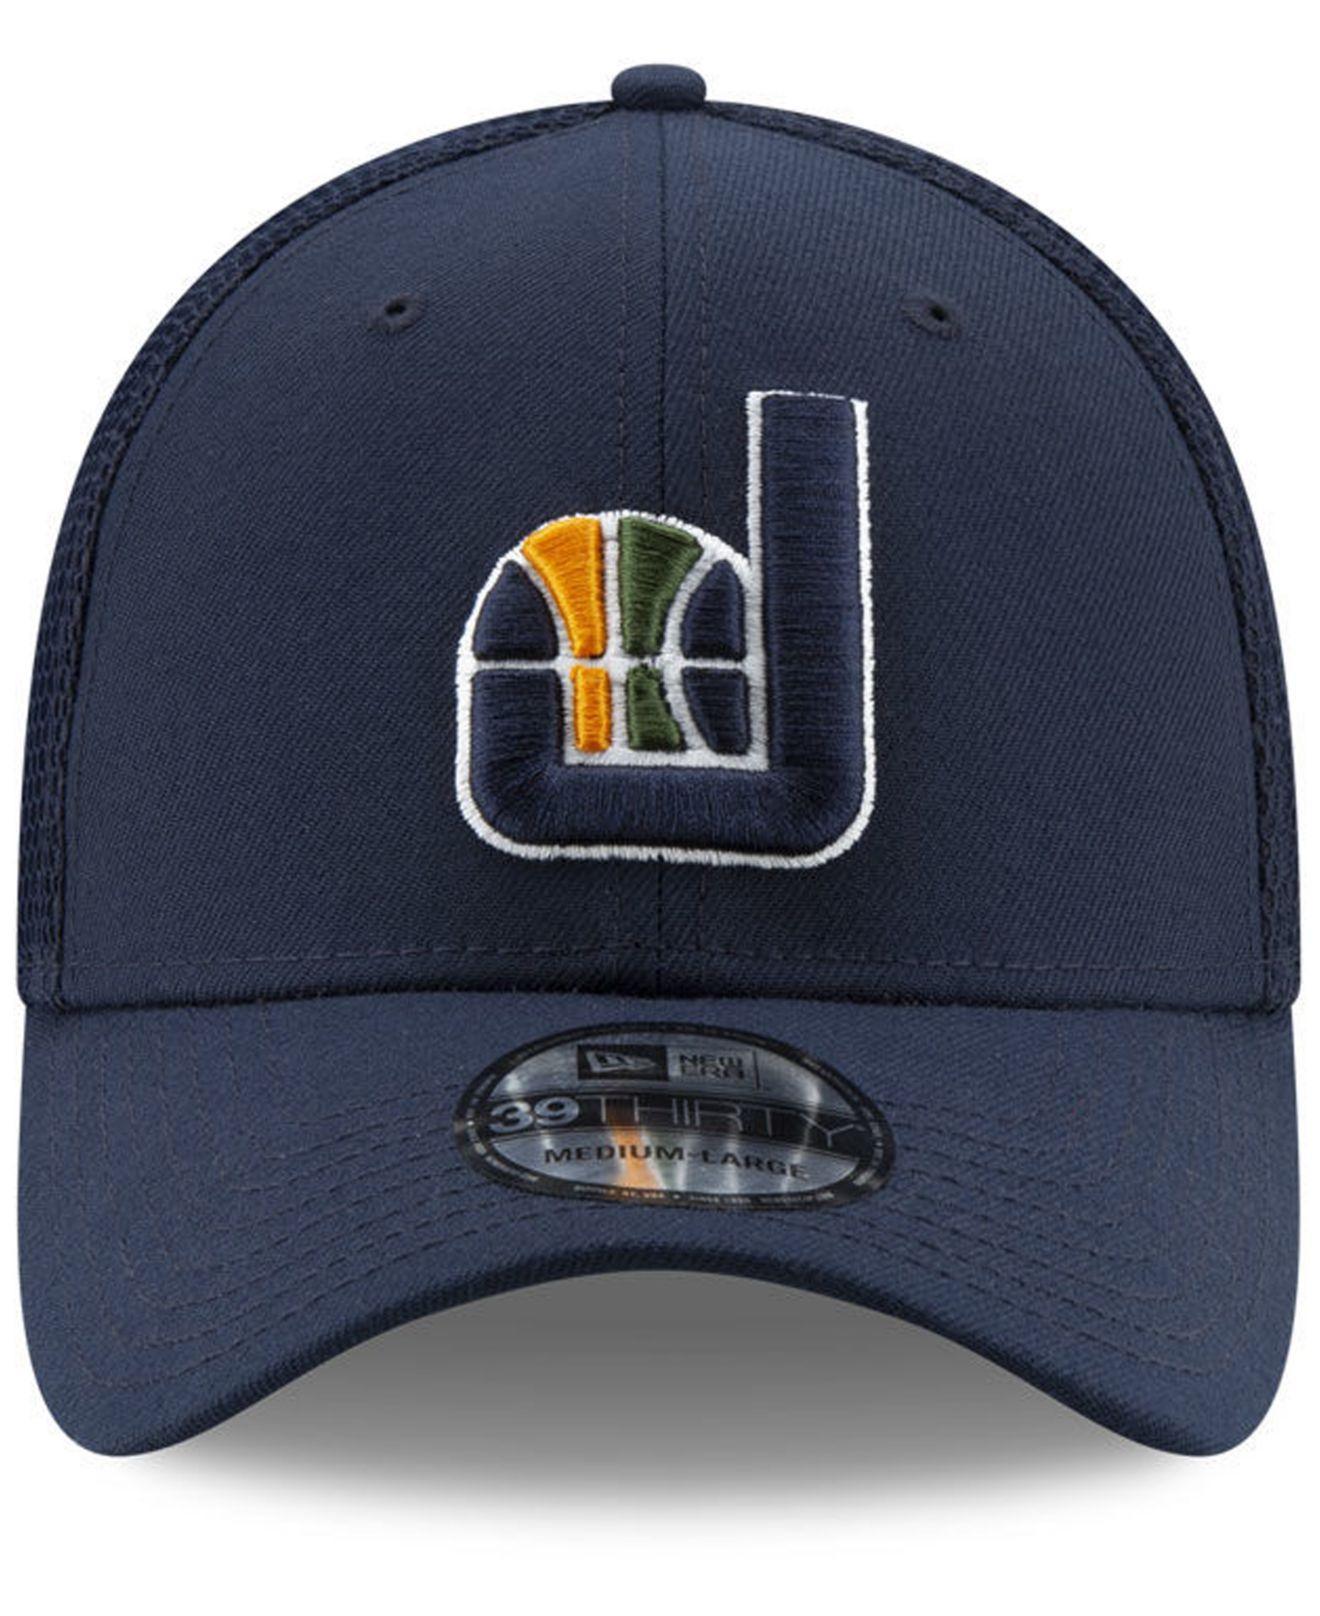 reputable site ab30f 98778 Lyst - KTZ Utah Jazz Back Half 39thirty Cap in Blue for Men